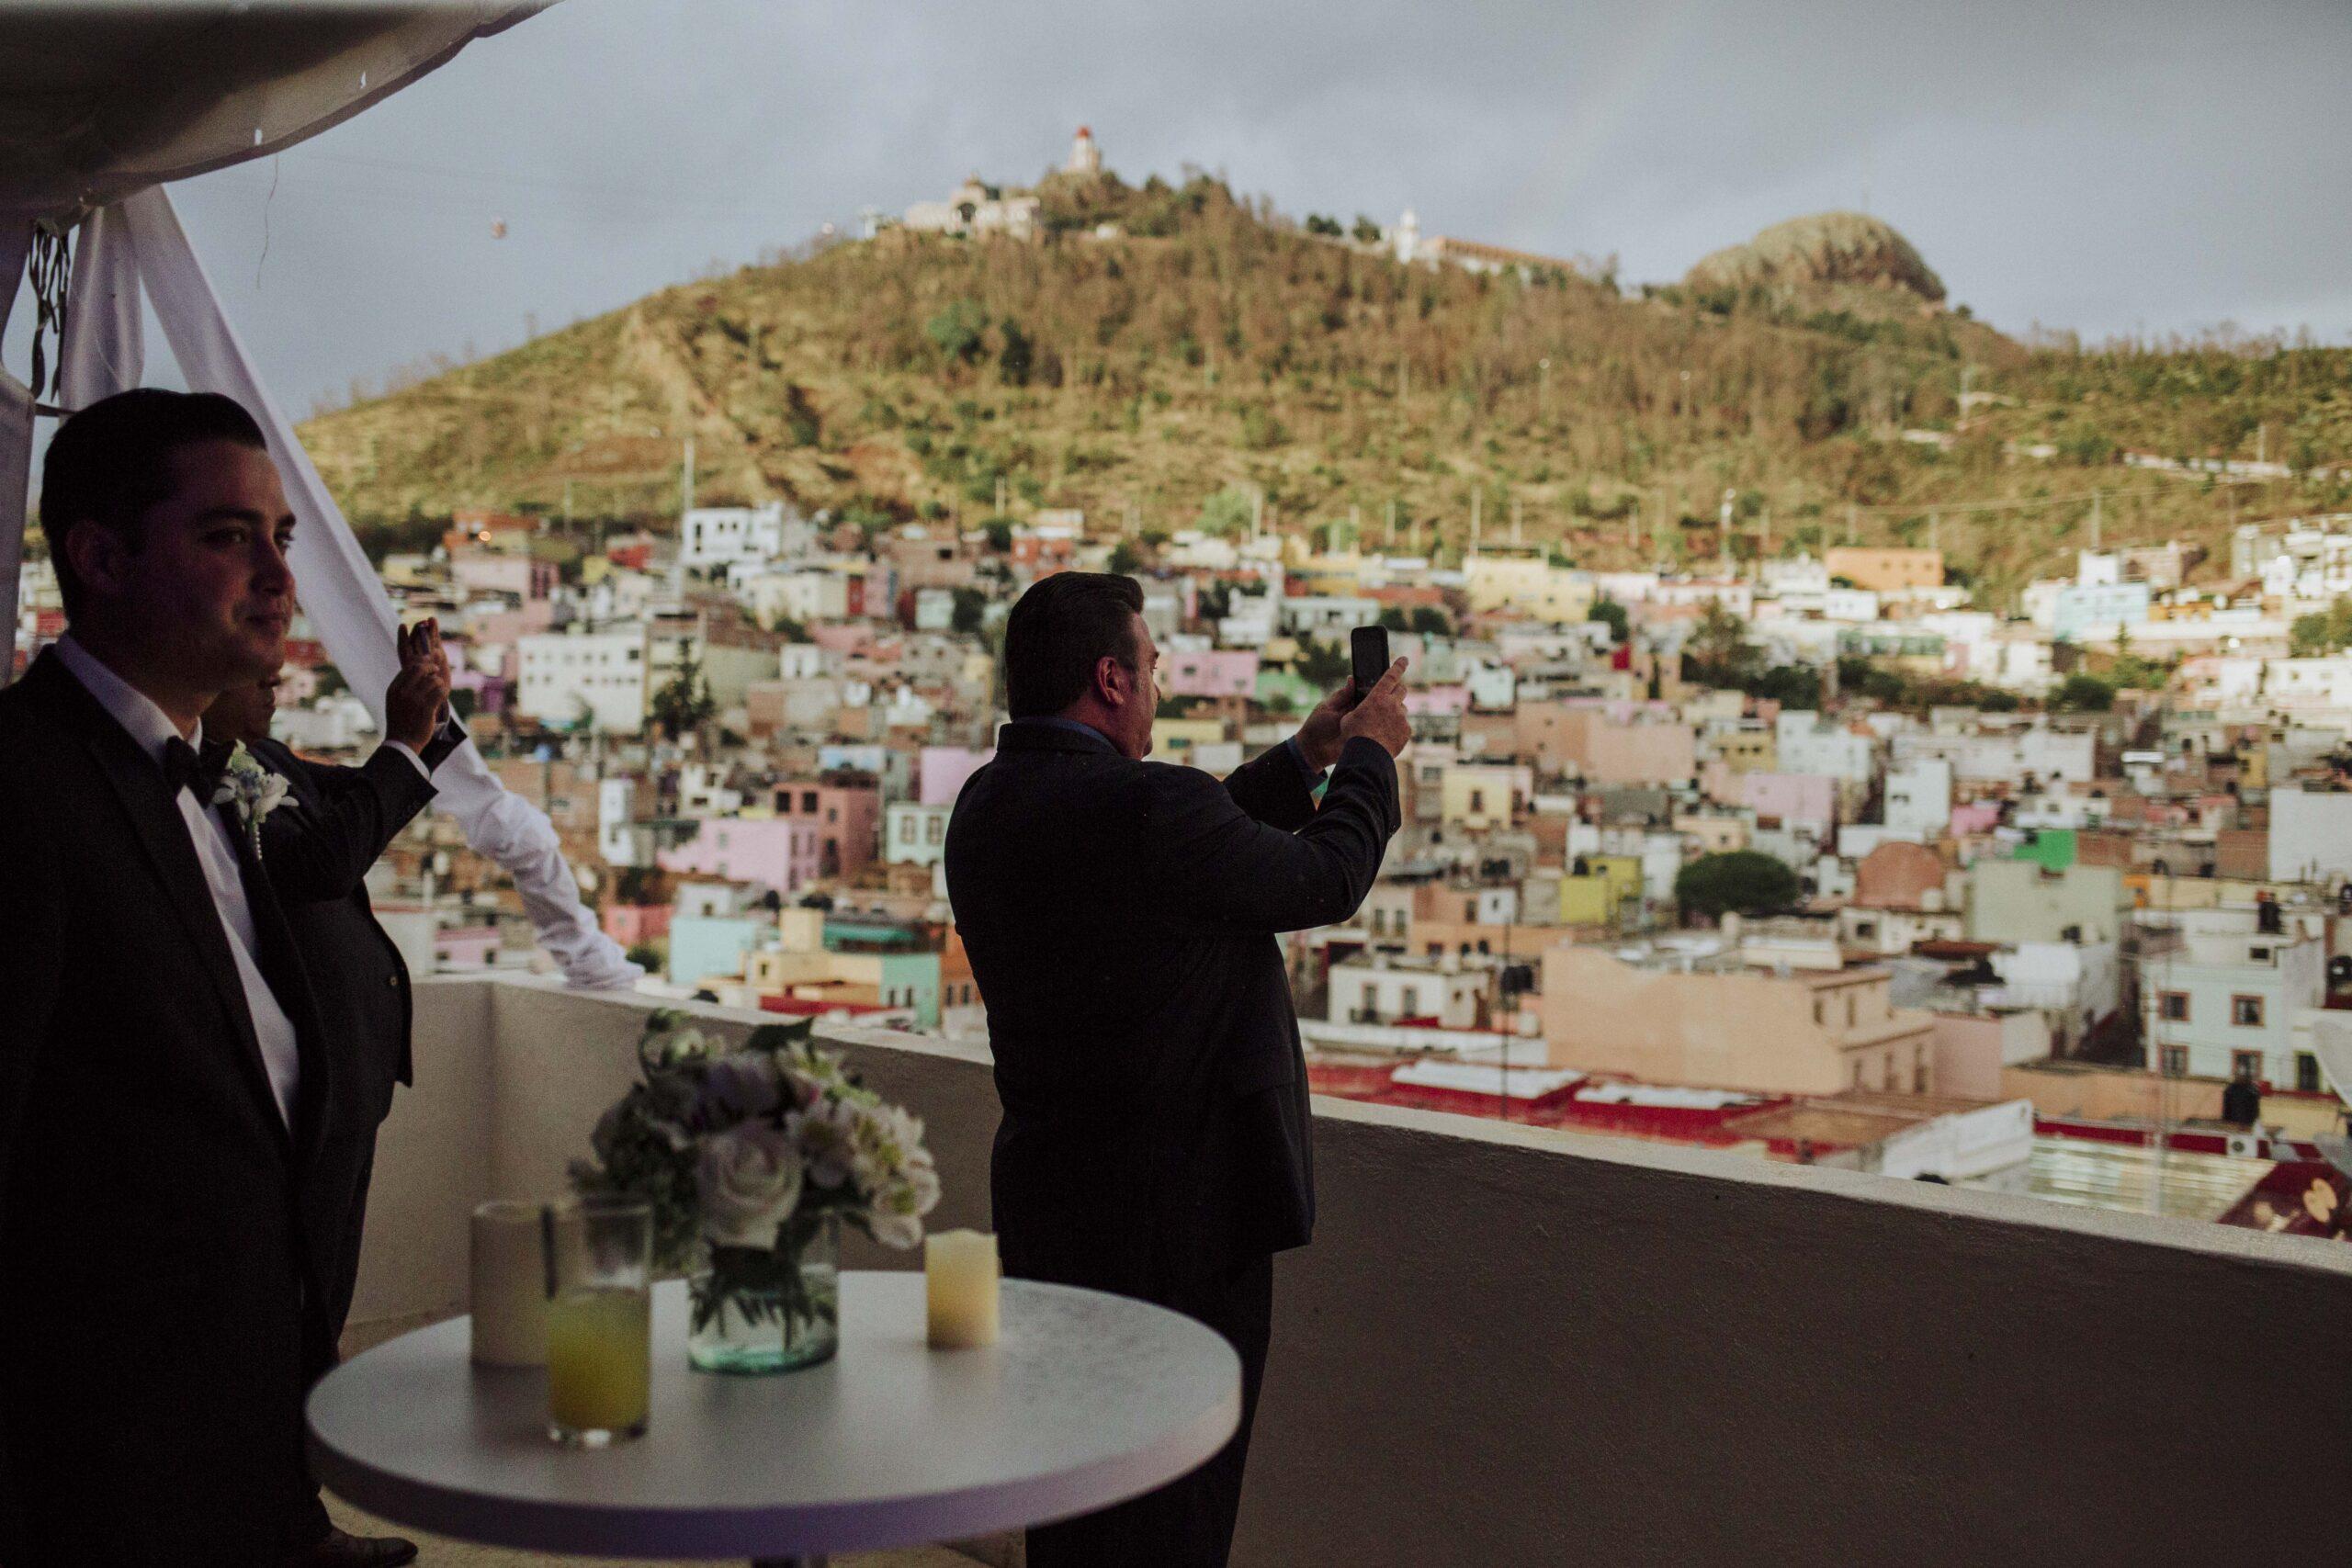 javier_noriega_fotografo_profesional_bodas_zacatecas_mexico_chihuahua_photographer71